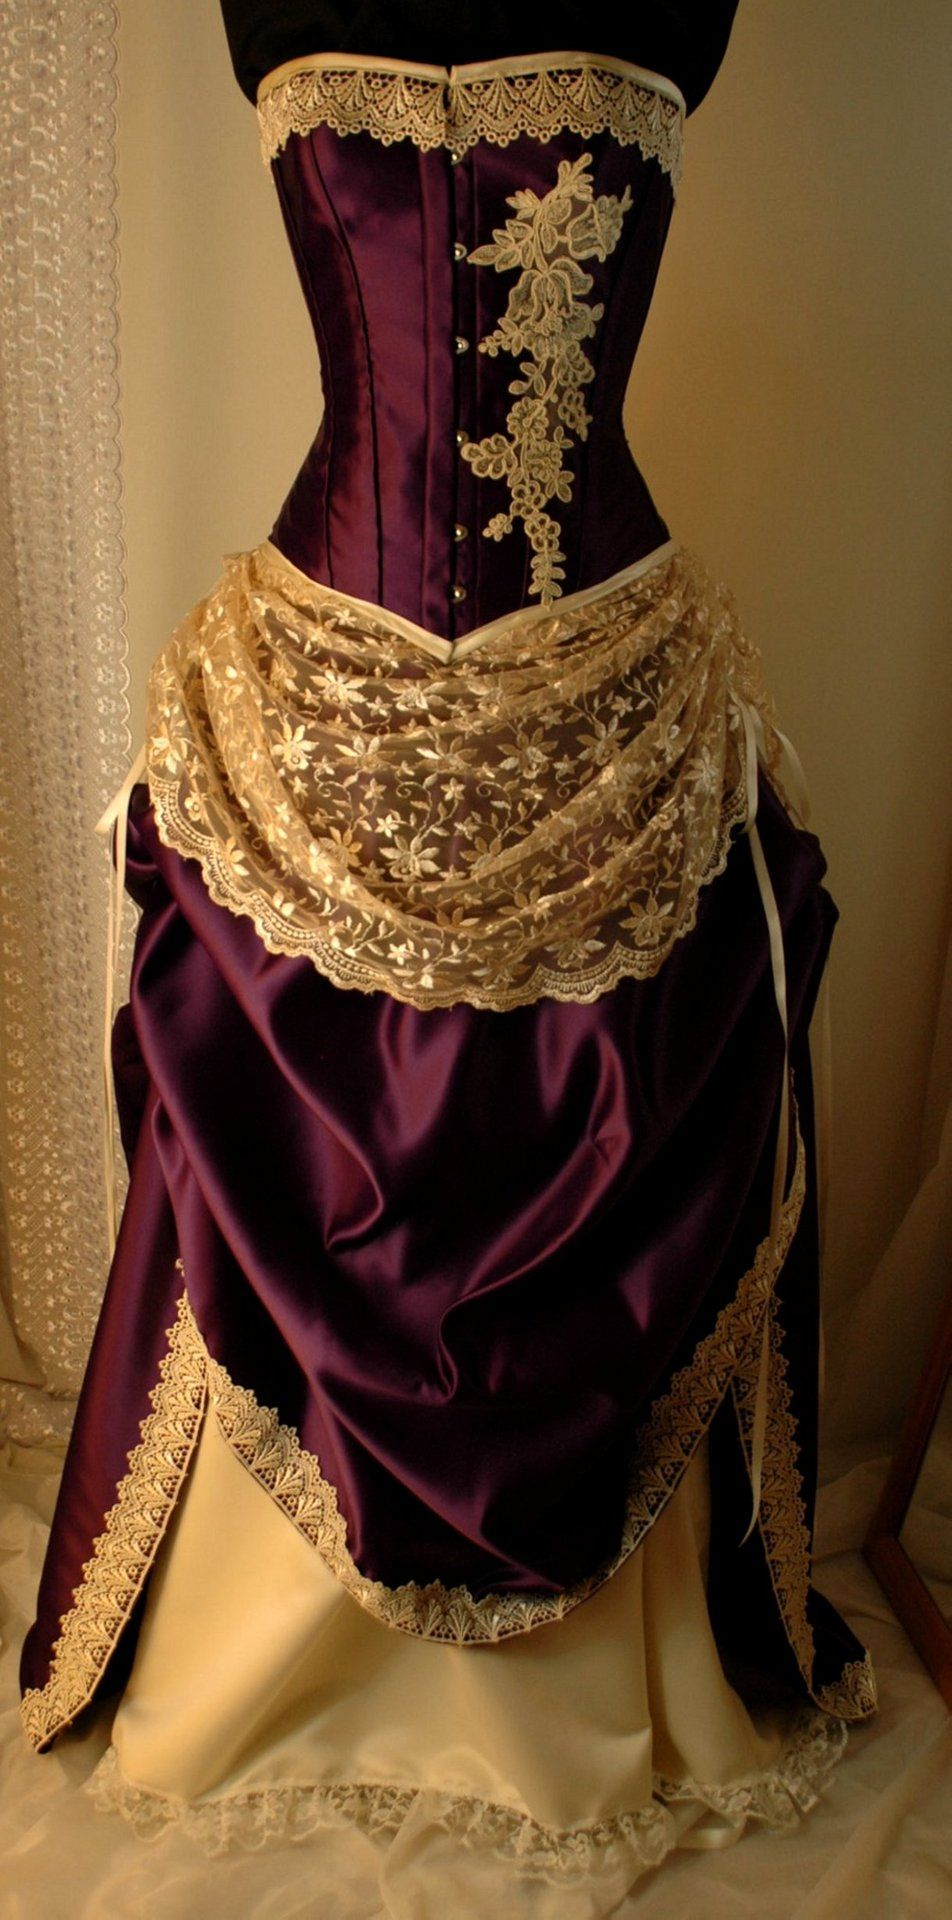 18th century wedding dress  missingsisterstill uc Front view see back viewdeep purplecream